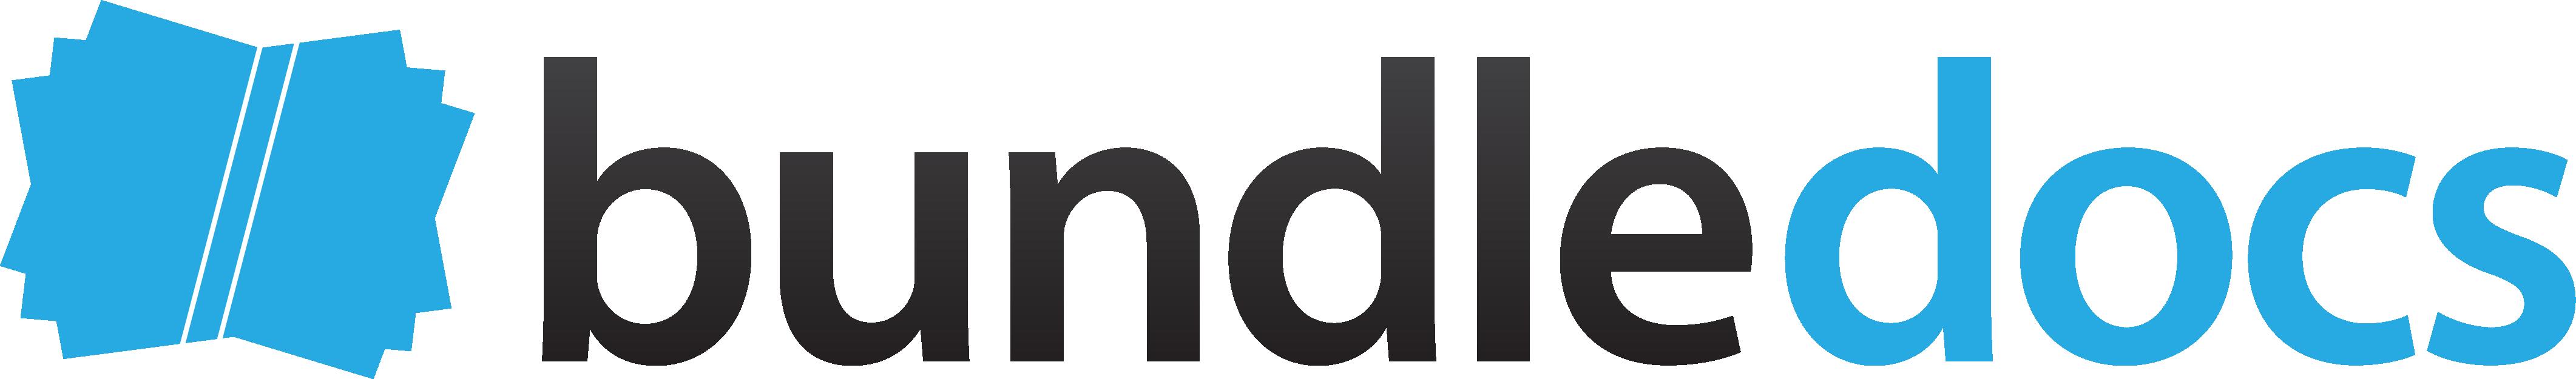 https://www.heylegal-news.co.uk/wp-content/uploads/2021/06/BundledocsLogo_Bundledocs_12042019.png